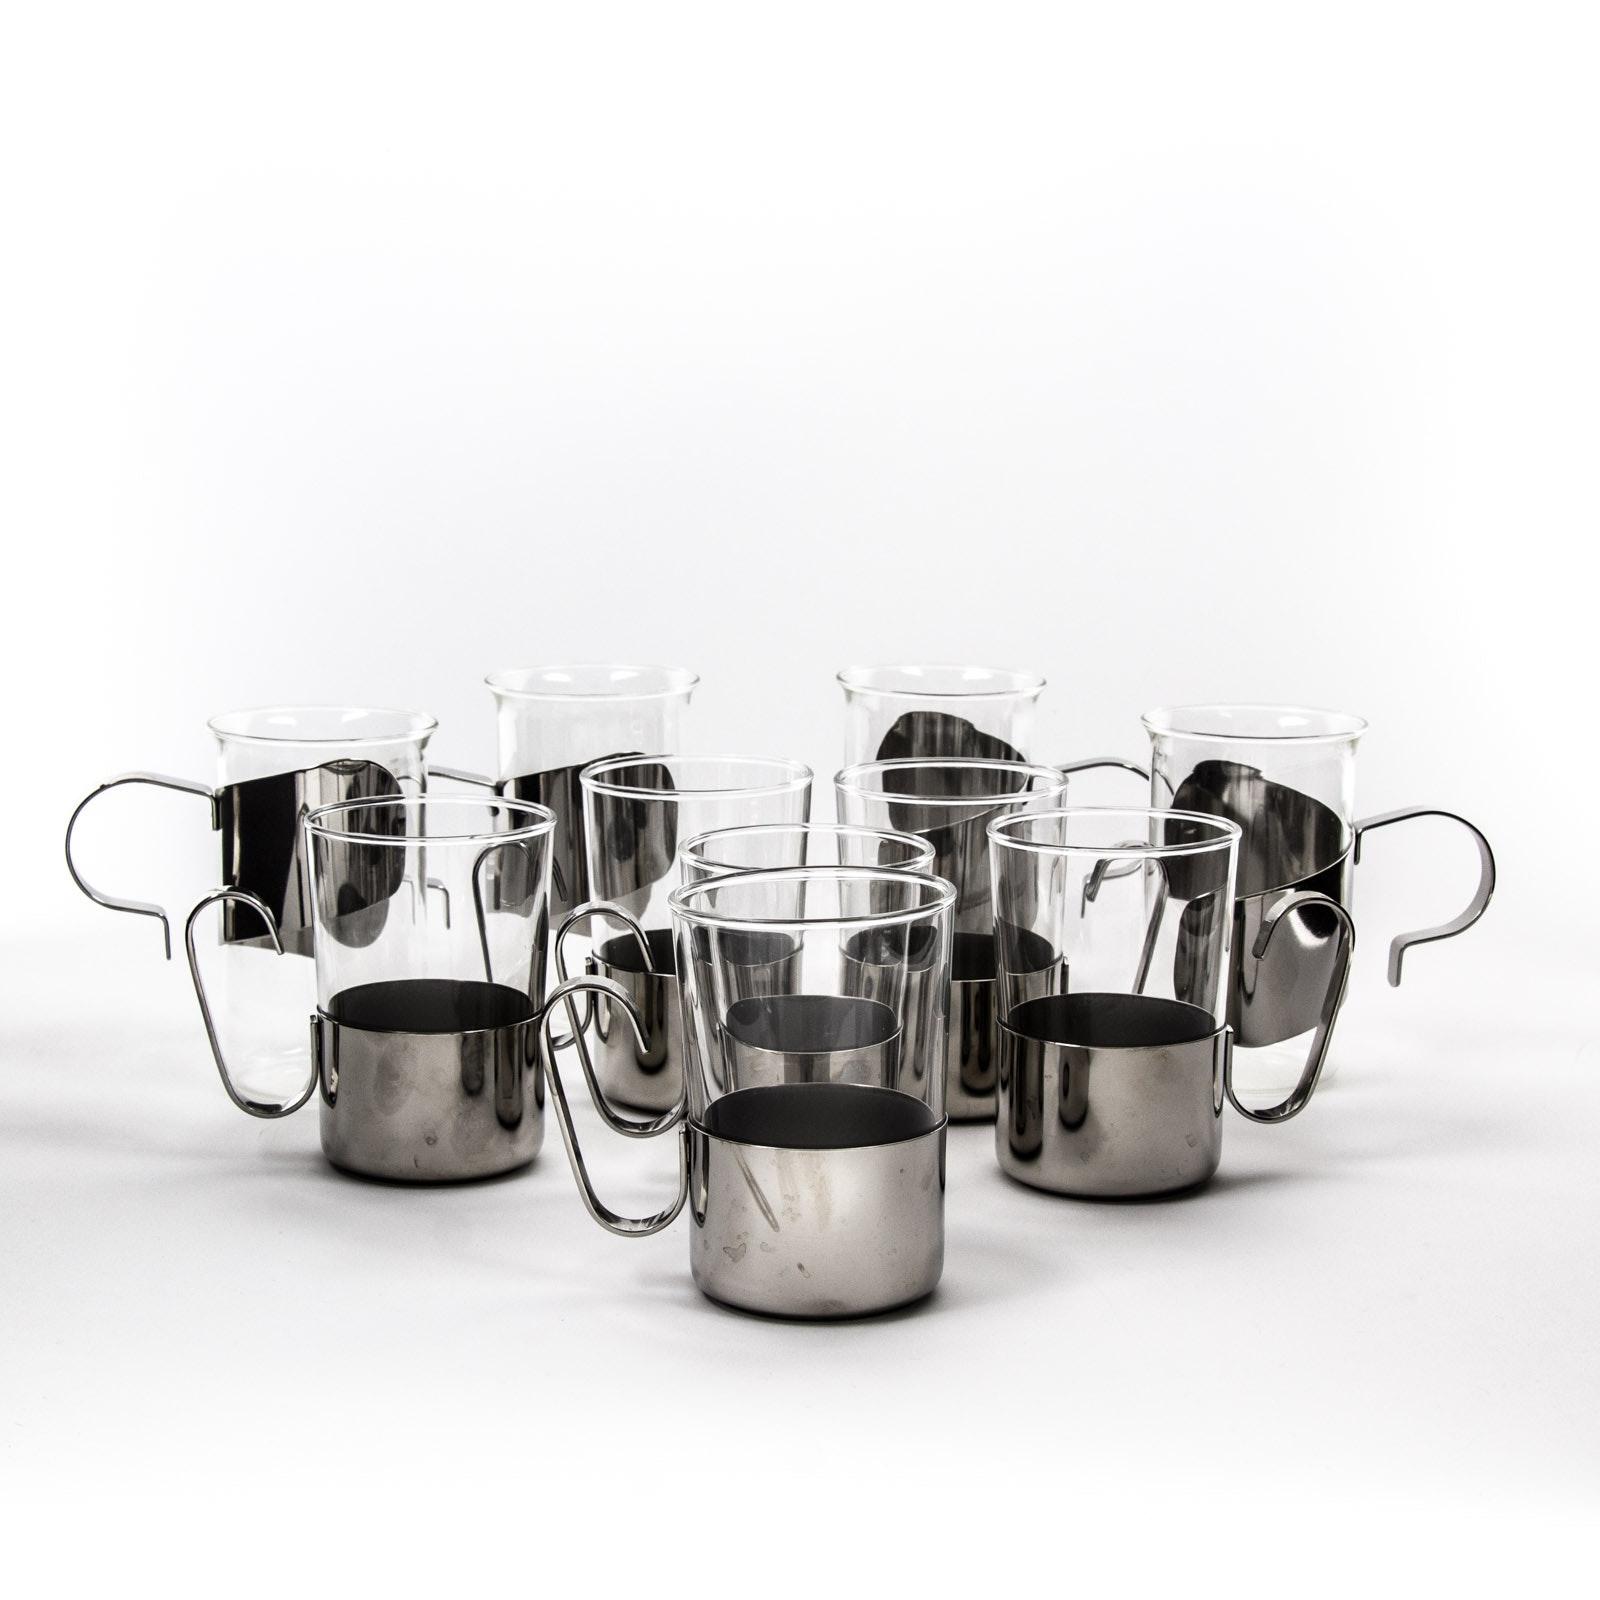 Glass and Metal Coffee Mugs